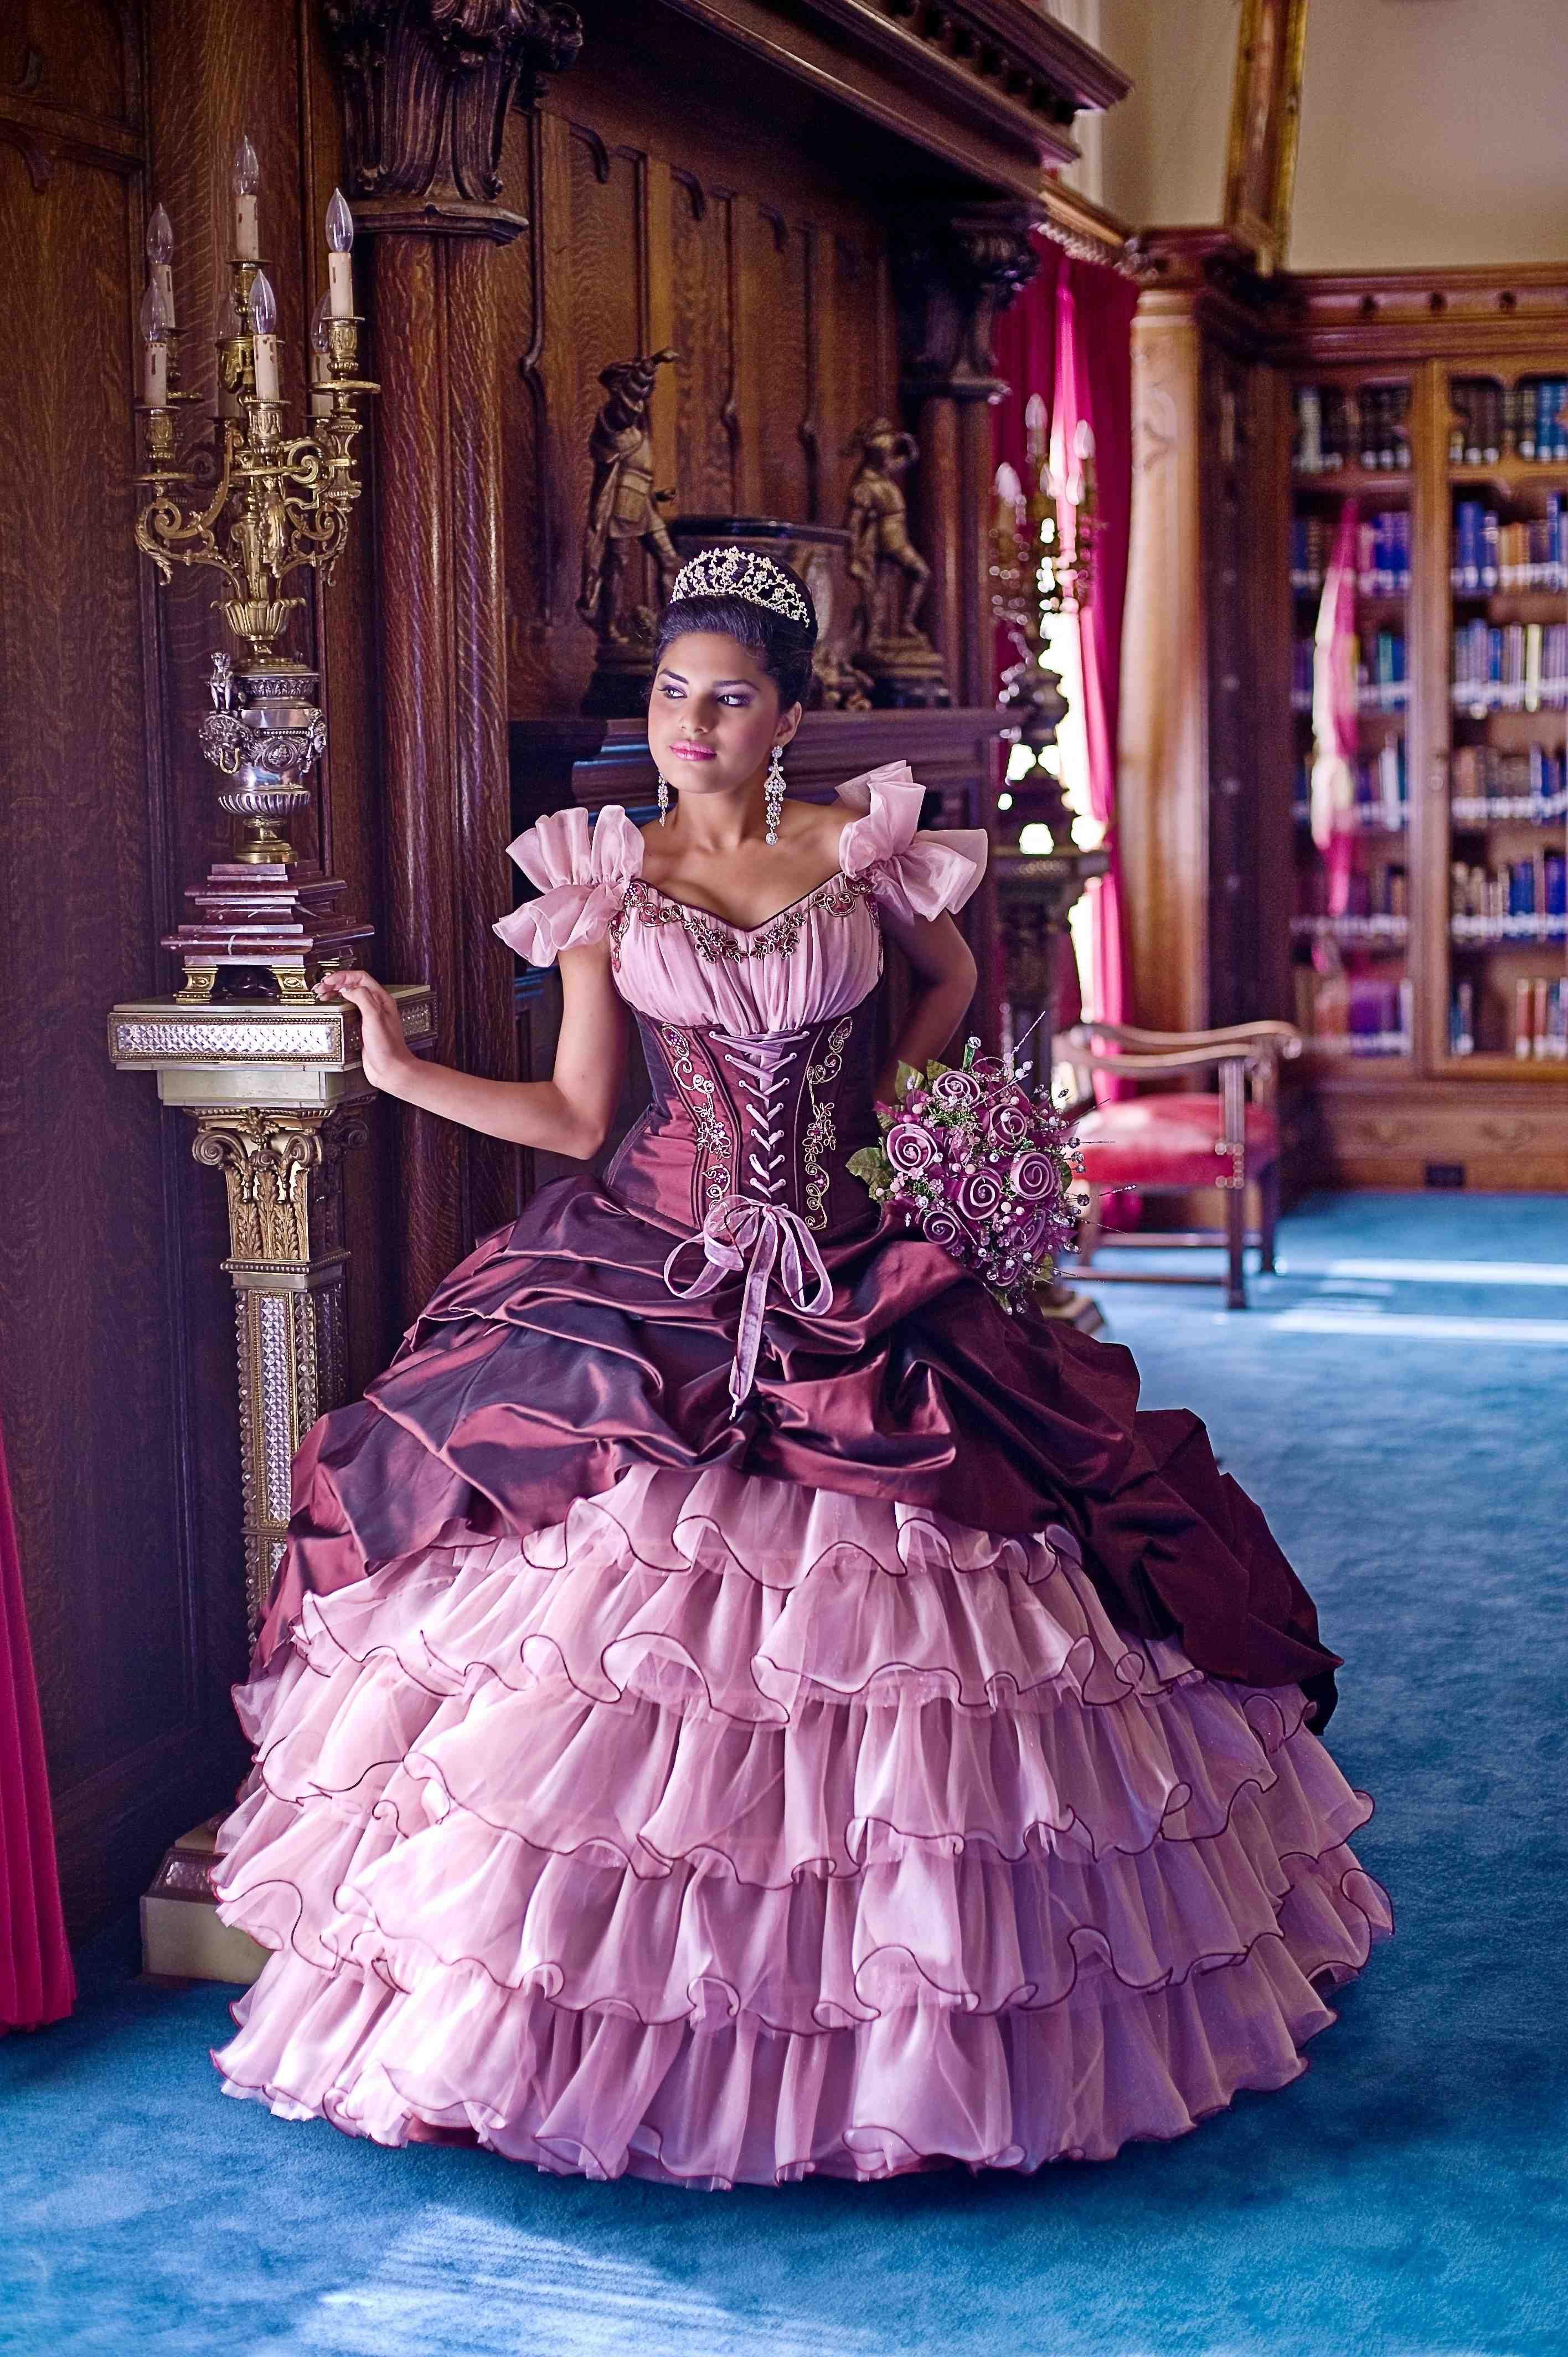 Purple Quince Dresses   azul   Pinterest   Quince dresses, Ball ...